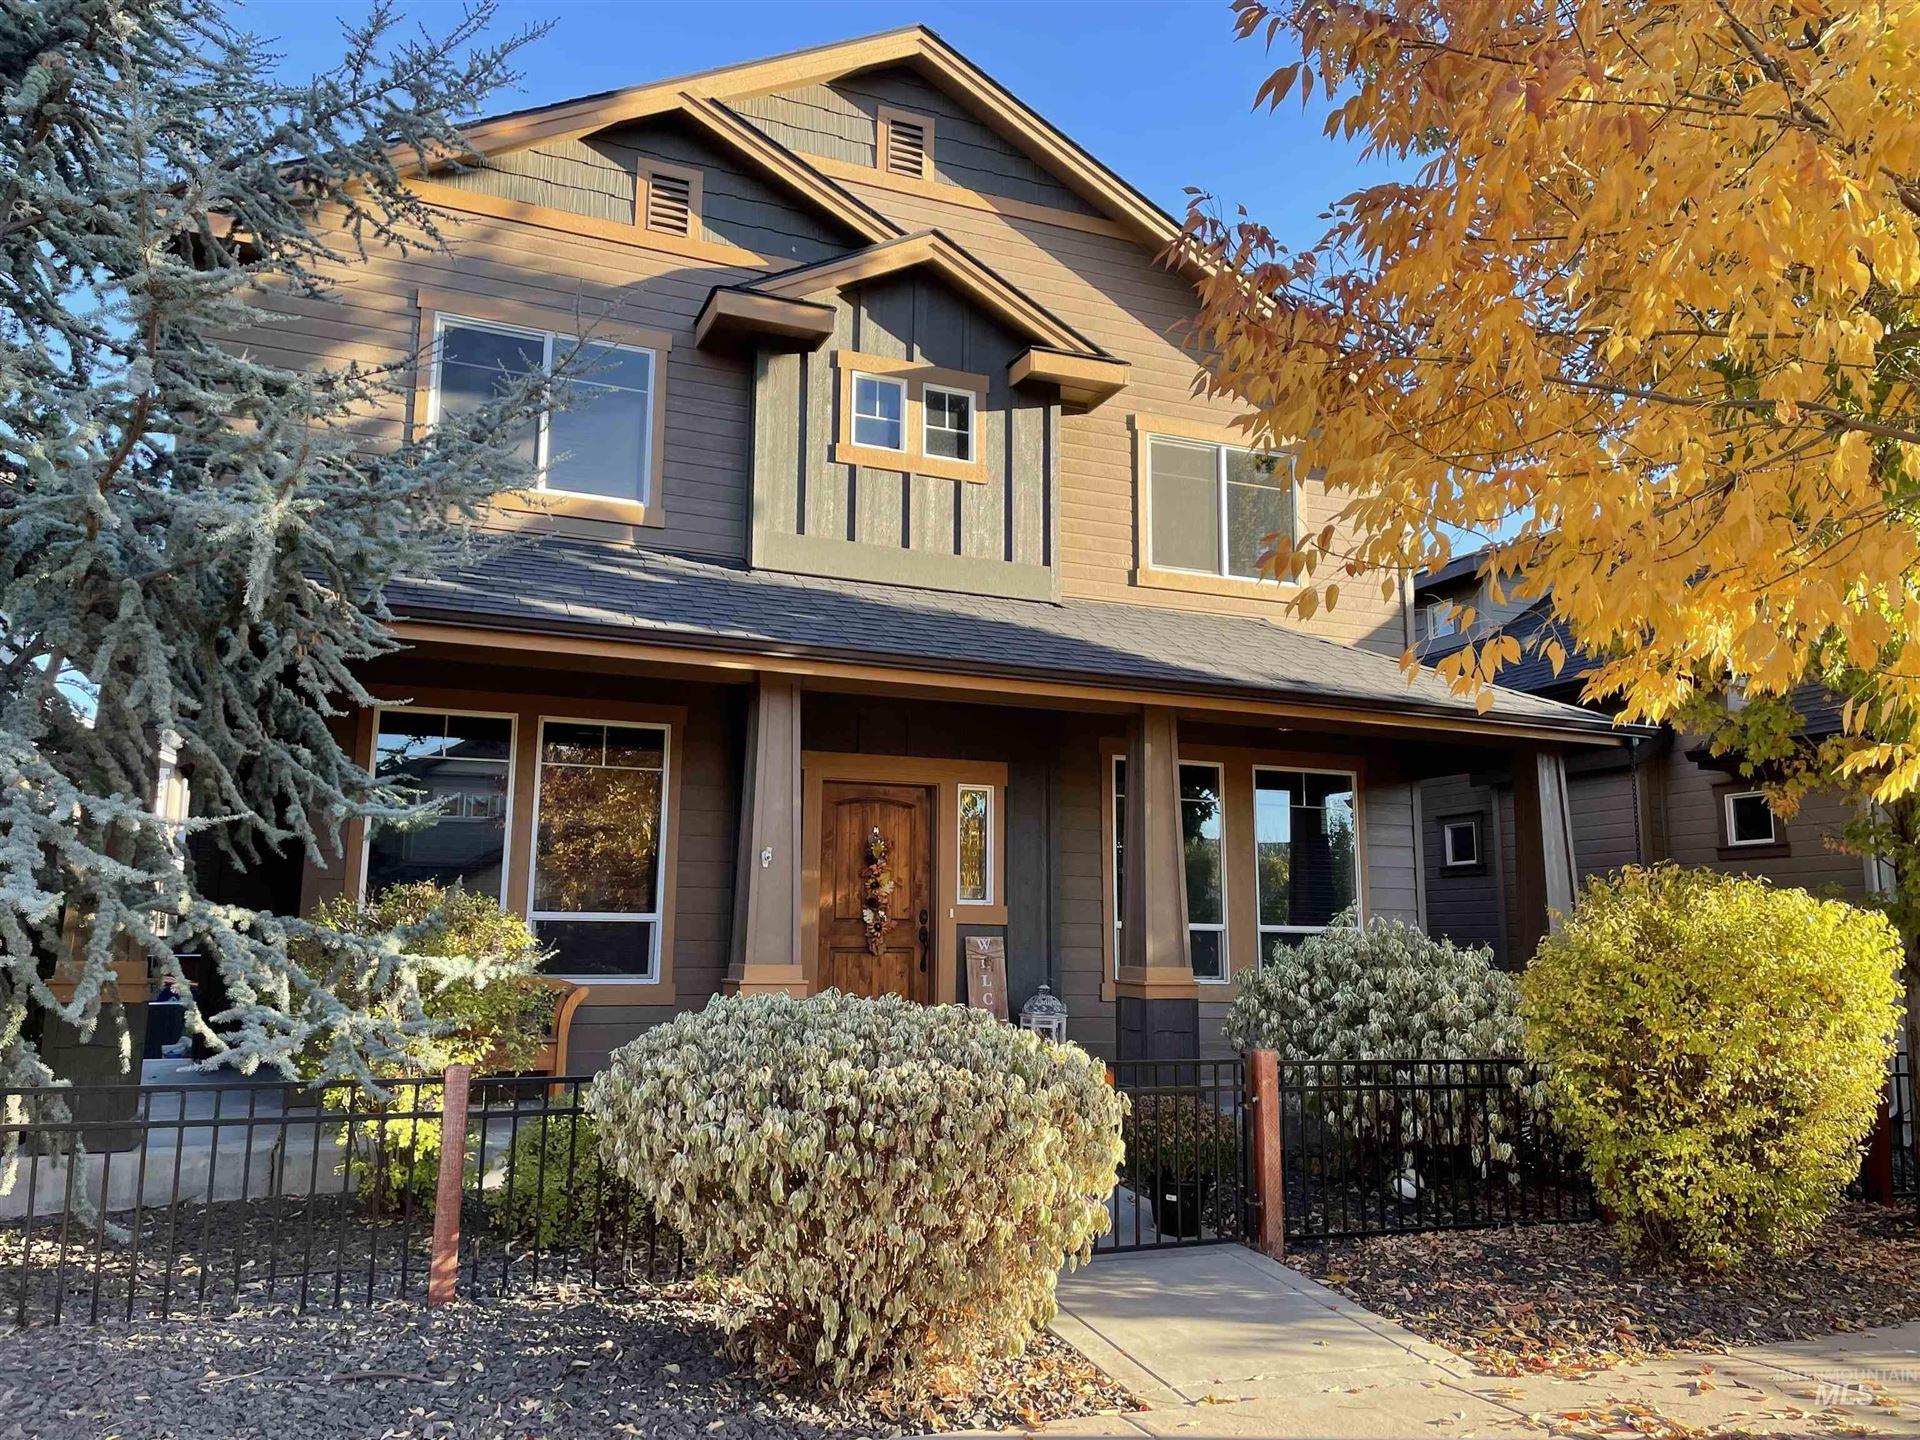 6756 S Talasi Ave, Boise, ID 83709 - MLS#: 98823139